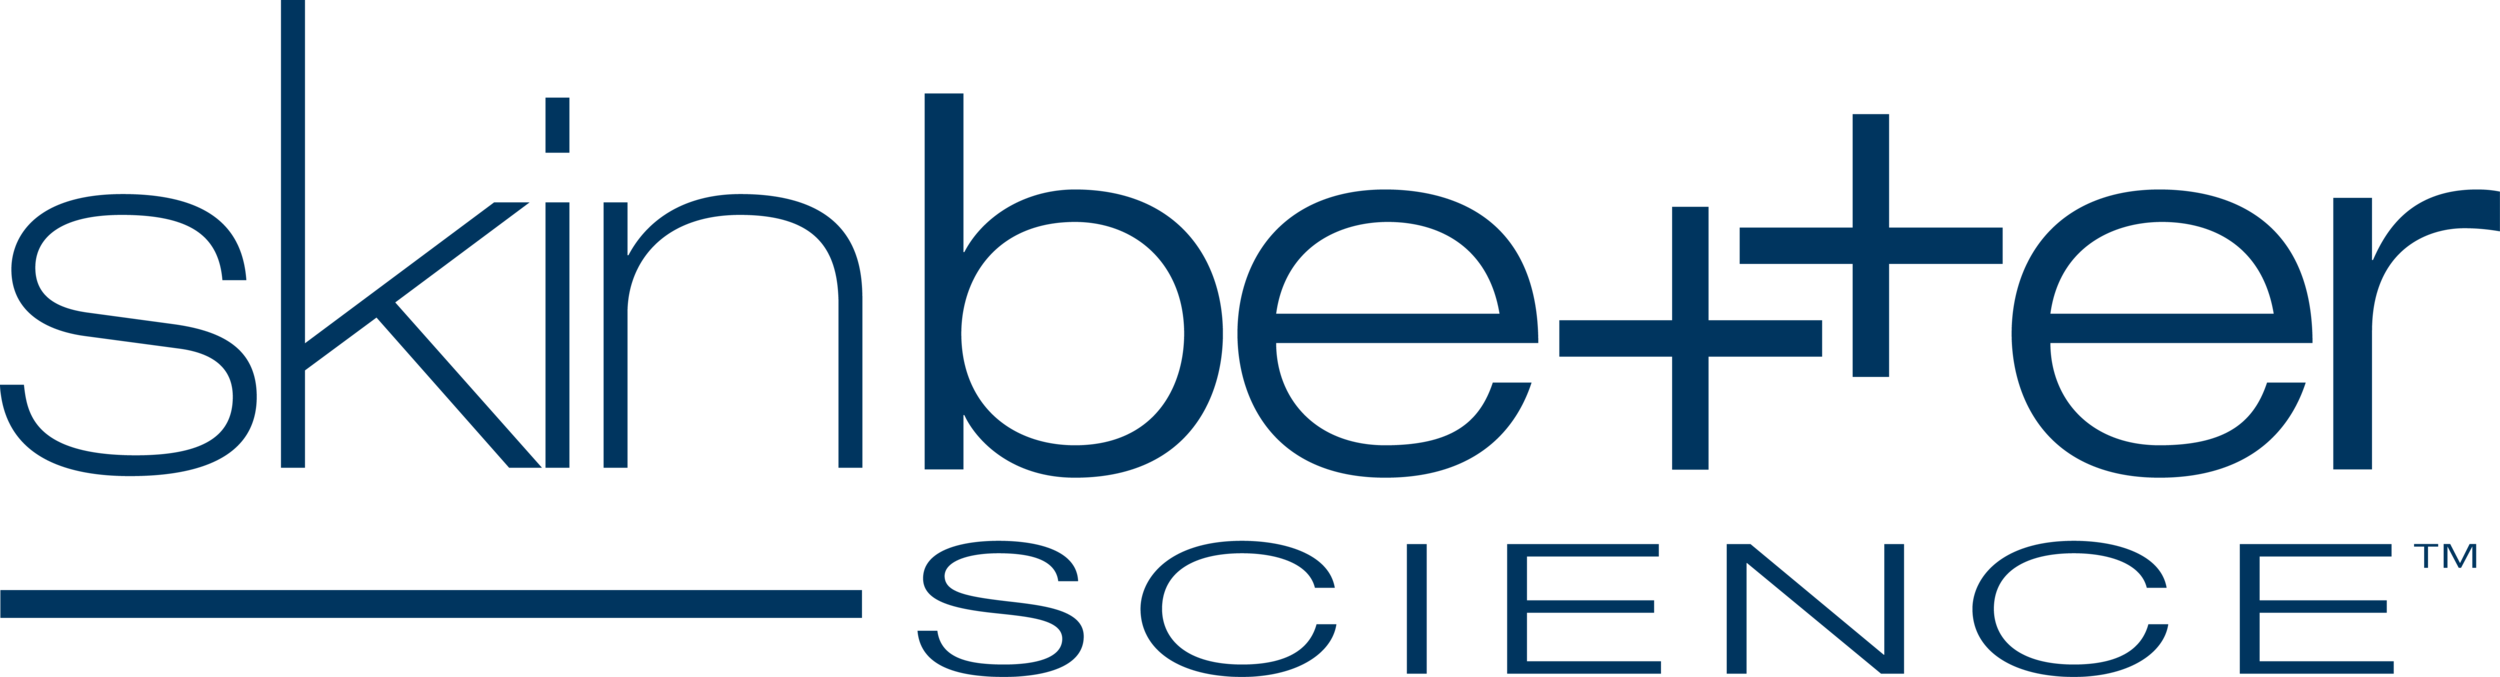 skinbetter_-logo_blue-on-white_RGBar.png